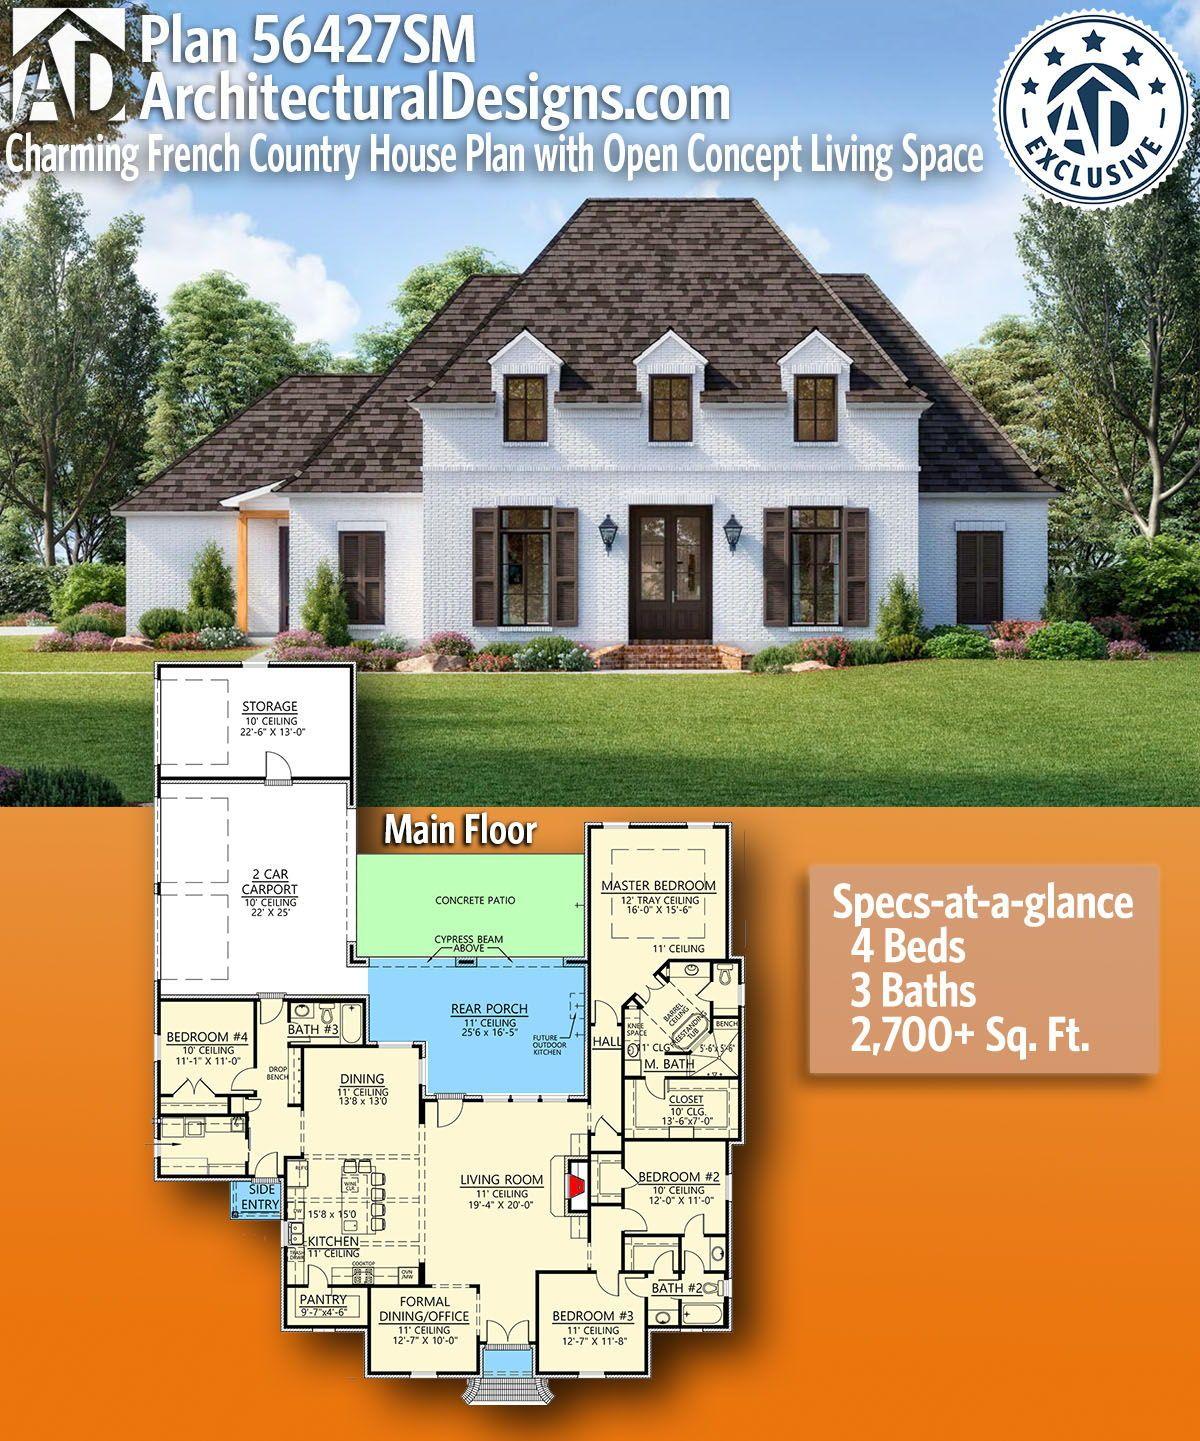 Plan 62636dj Modern Garage Plan With 3 Bays In 2021 French Country House Plans French Country House French House Plans